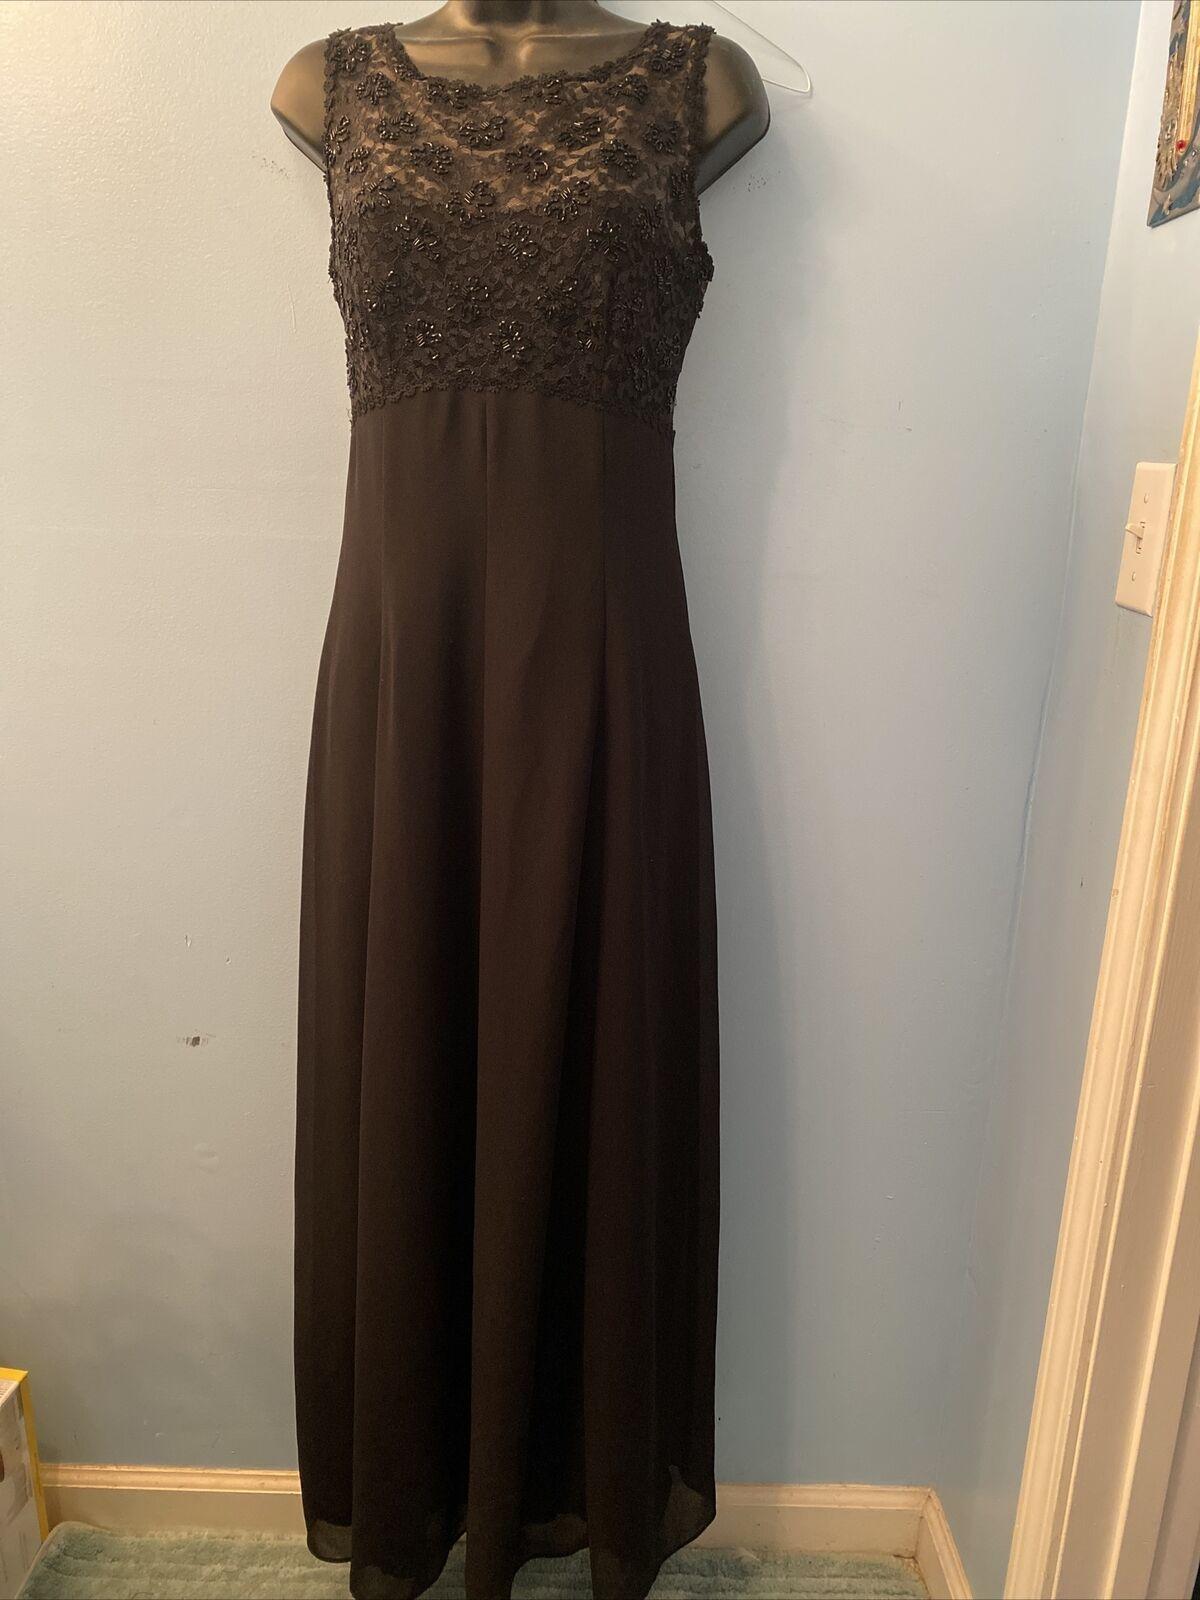 EVER BEAUTY Sz 4 Lace Bodice Sleeveless Black Beaded Evening Gown FullLength EUC